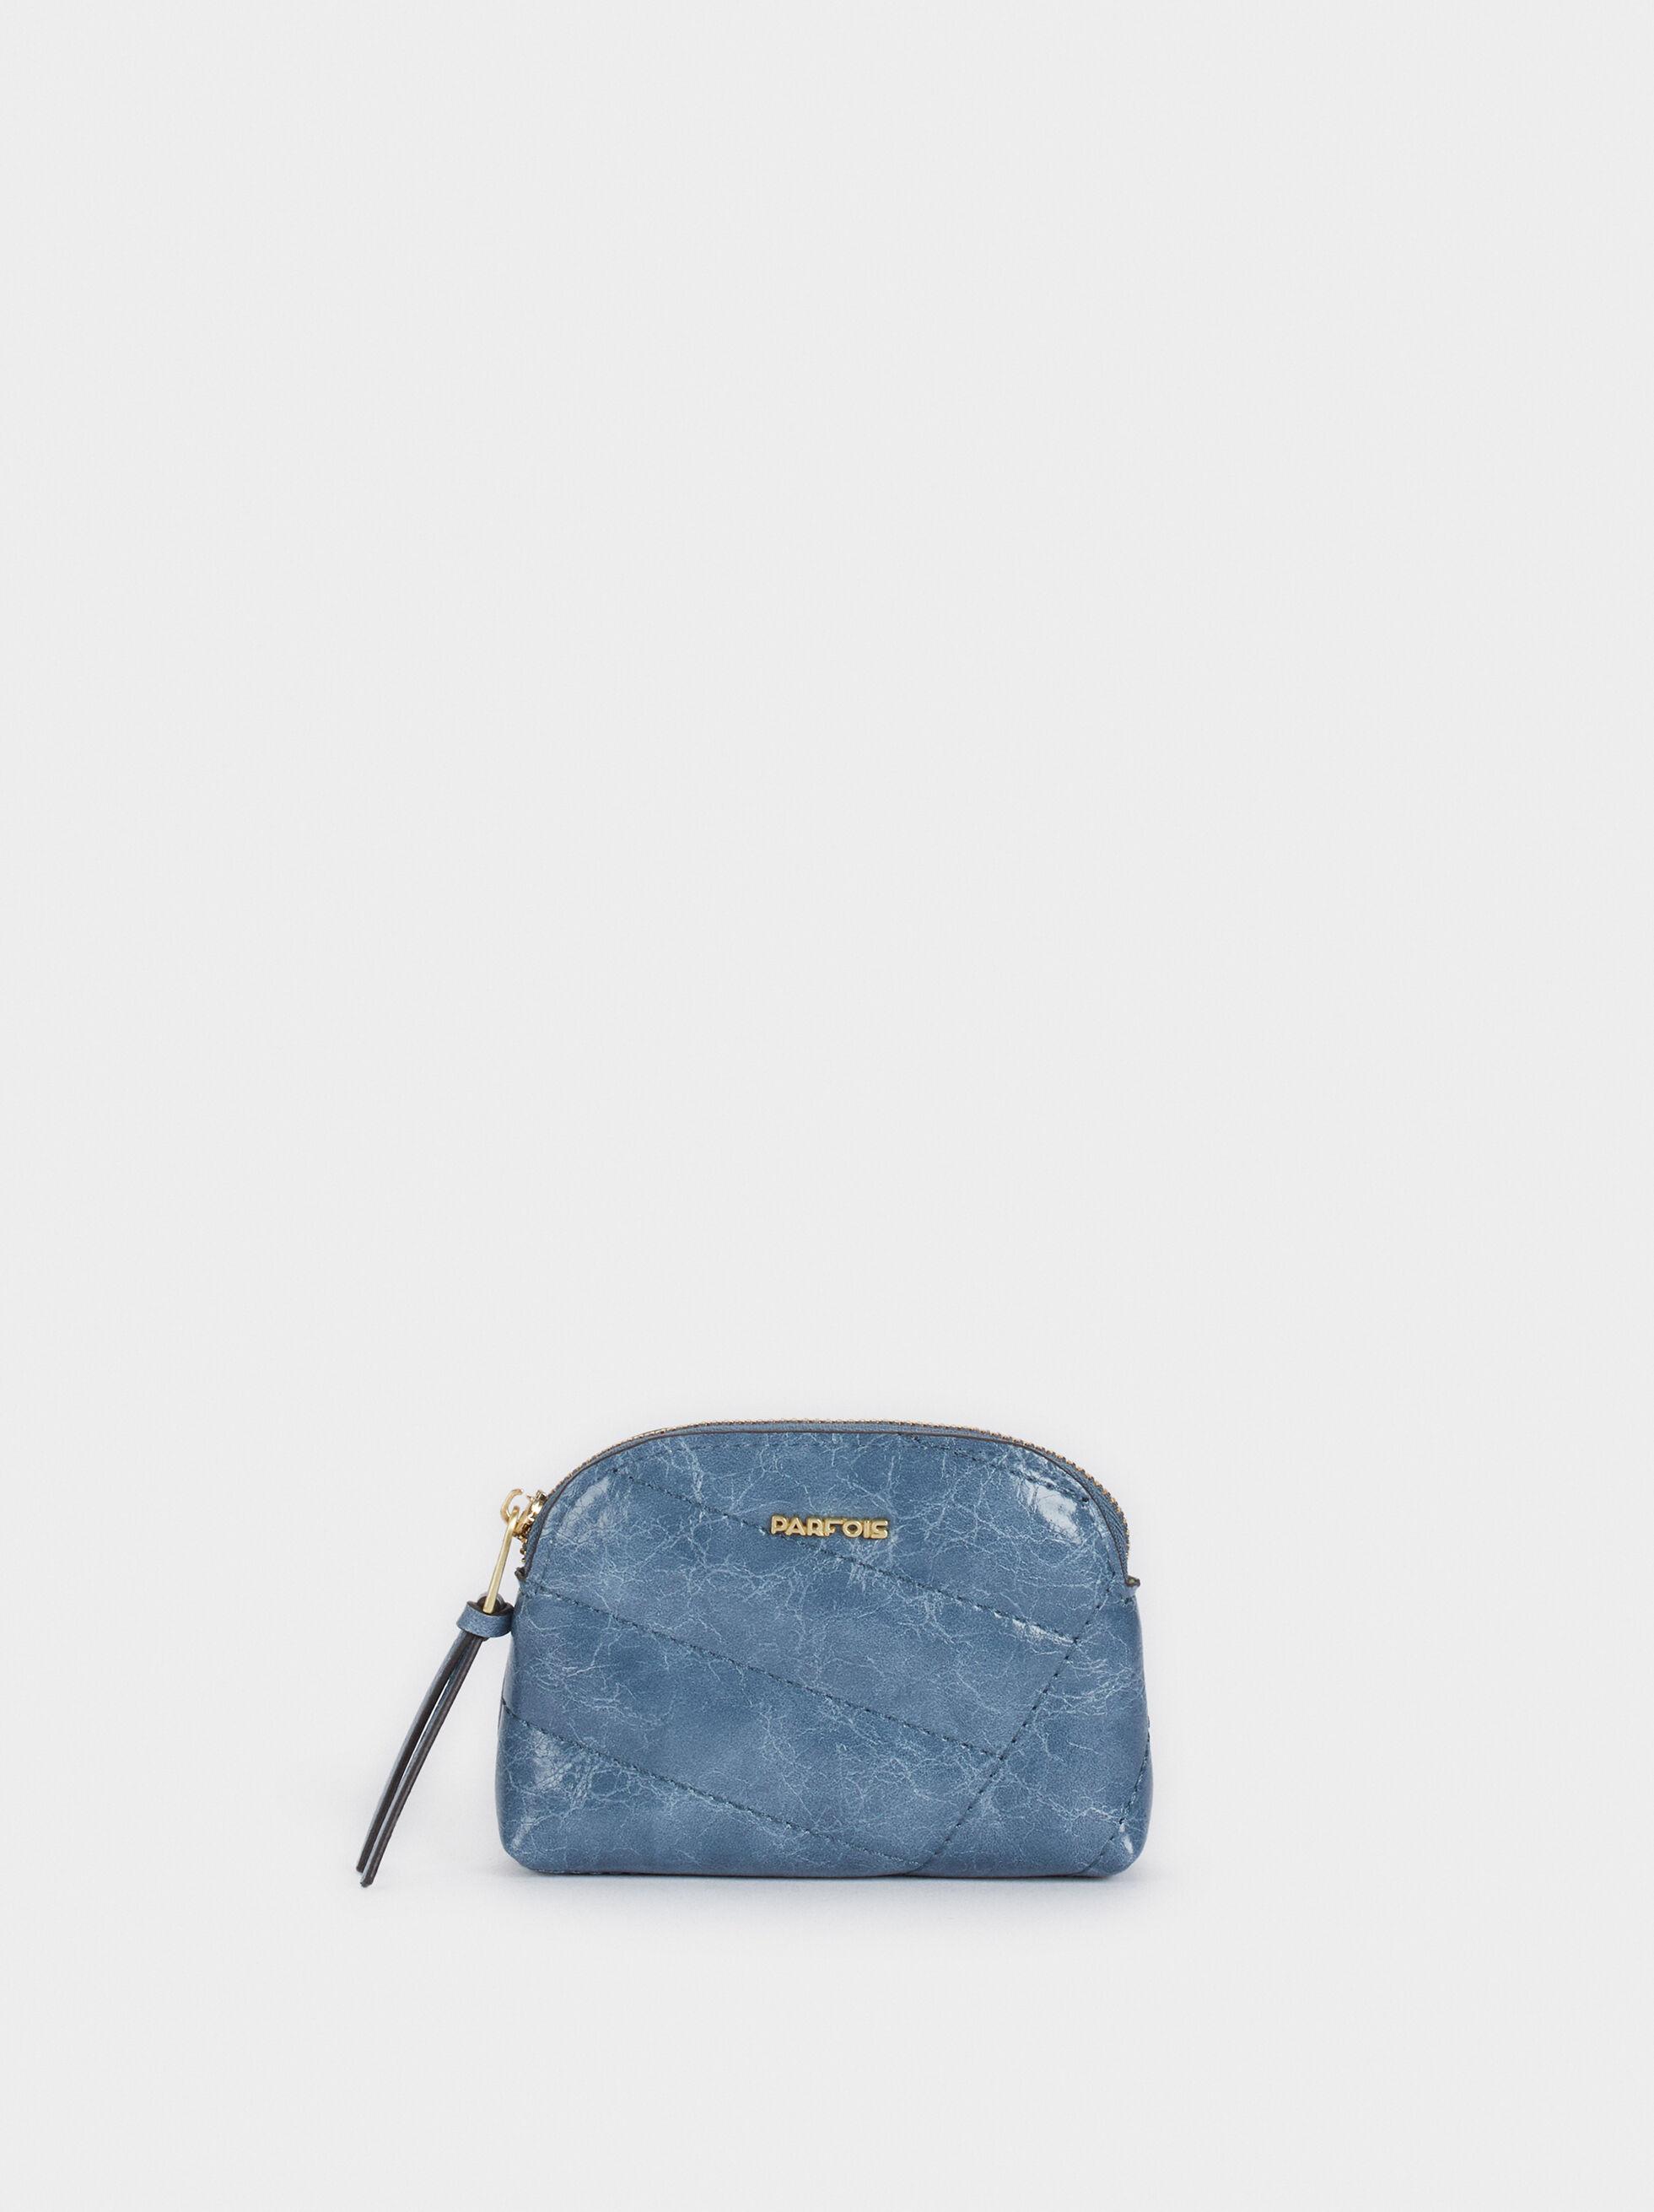 Porte-Monnaie Matelasée, Bleu, hi-res